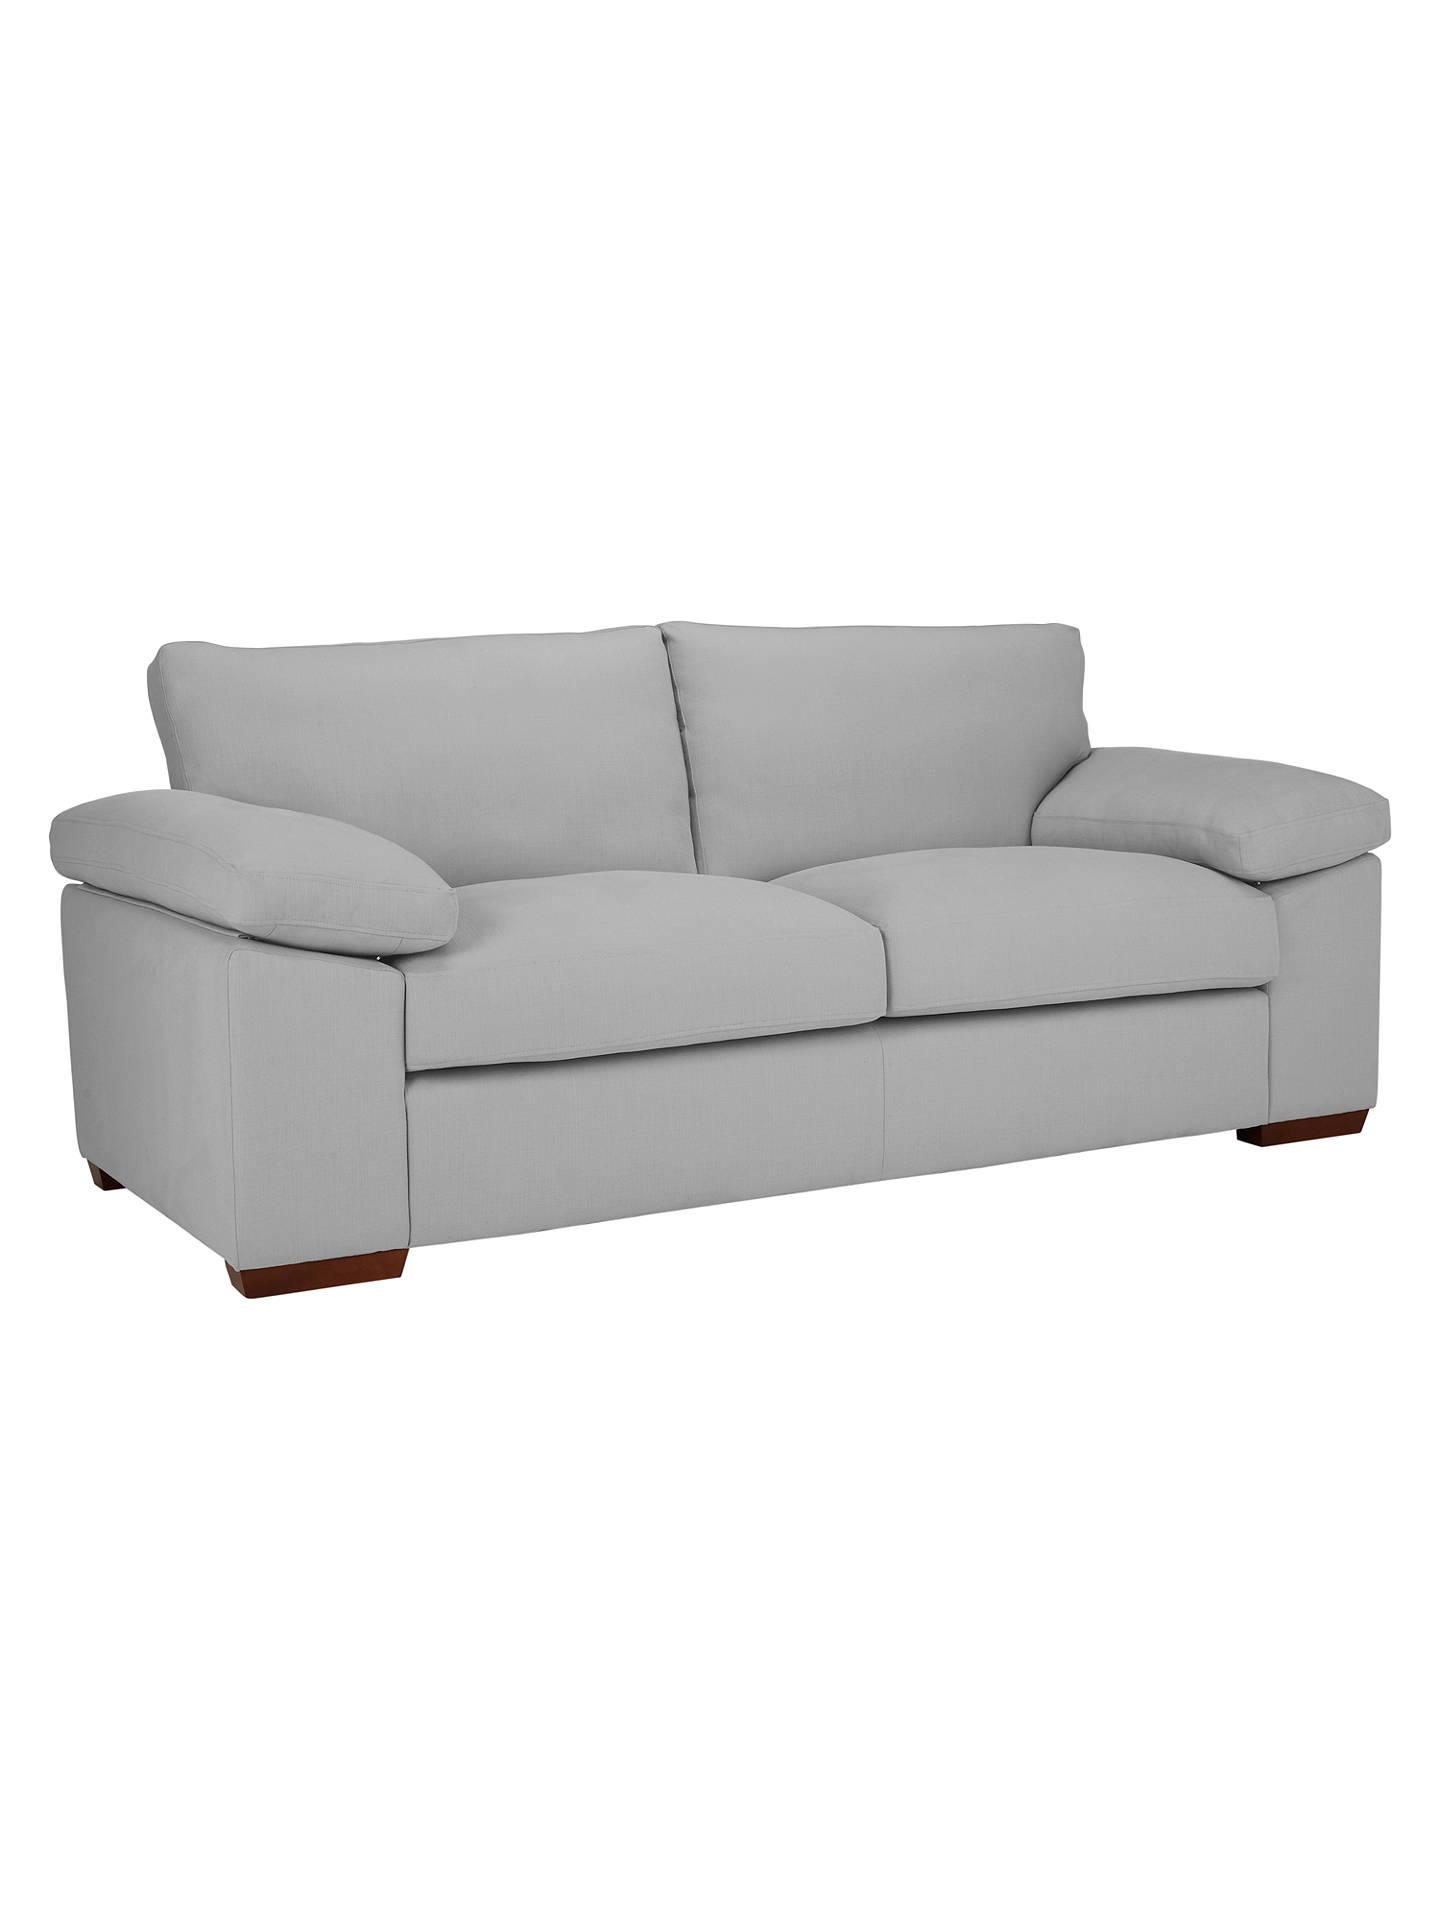 John Lewis Marshall Grand 4 Seater Sofa Elena Charcoal Online At Johnlewis